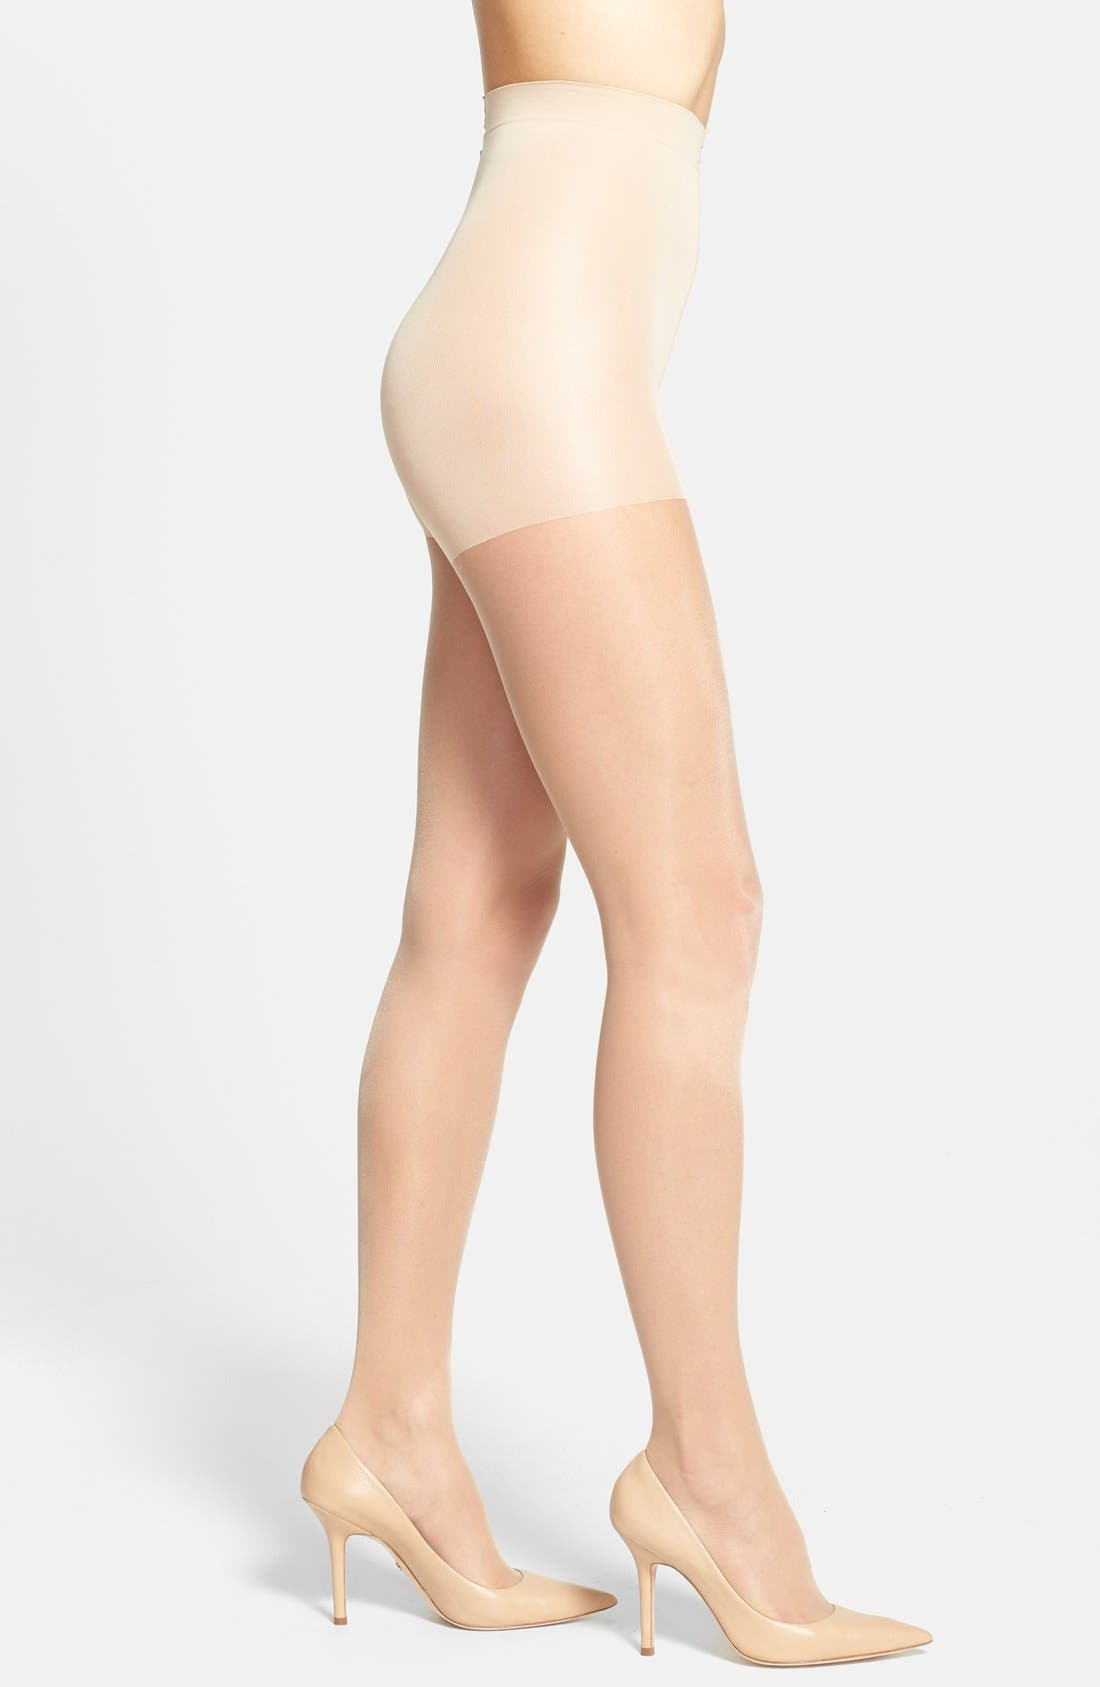 CALVIN KLEIN 'Sheer Essentials - Matte Ultra Sheer' Control Top Pantyhose, Main, color, BUFF